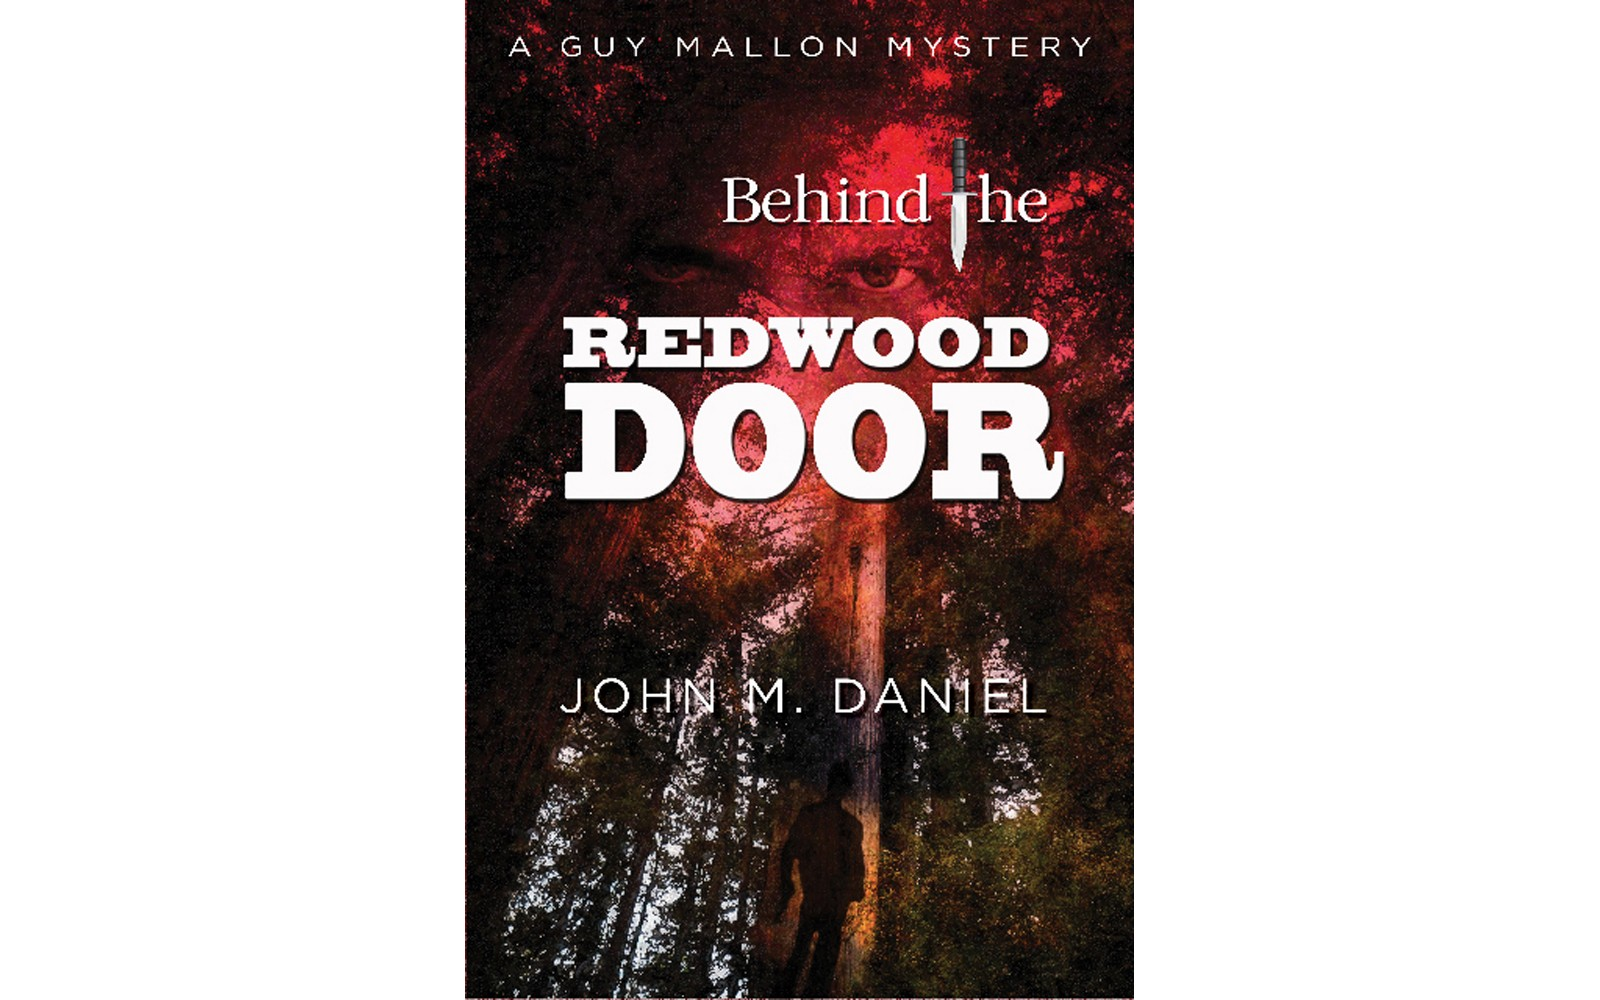 Behind the Redwood Door - BY JOHN M. DANIEL - OAK TREE PRESS